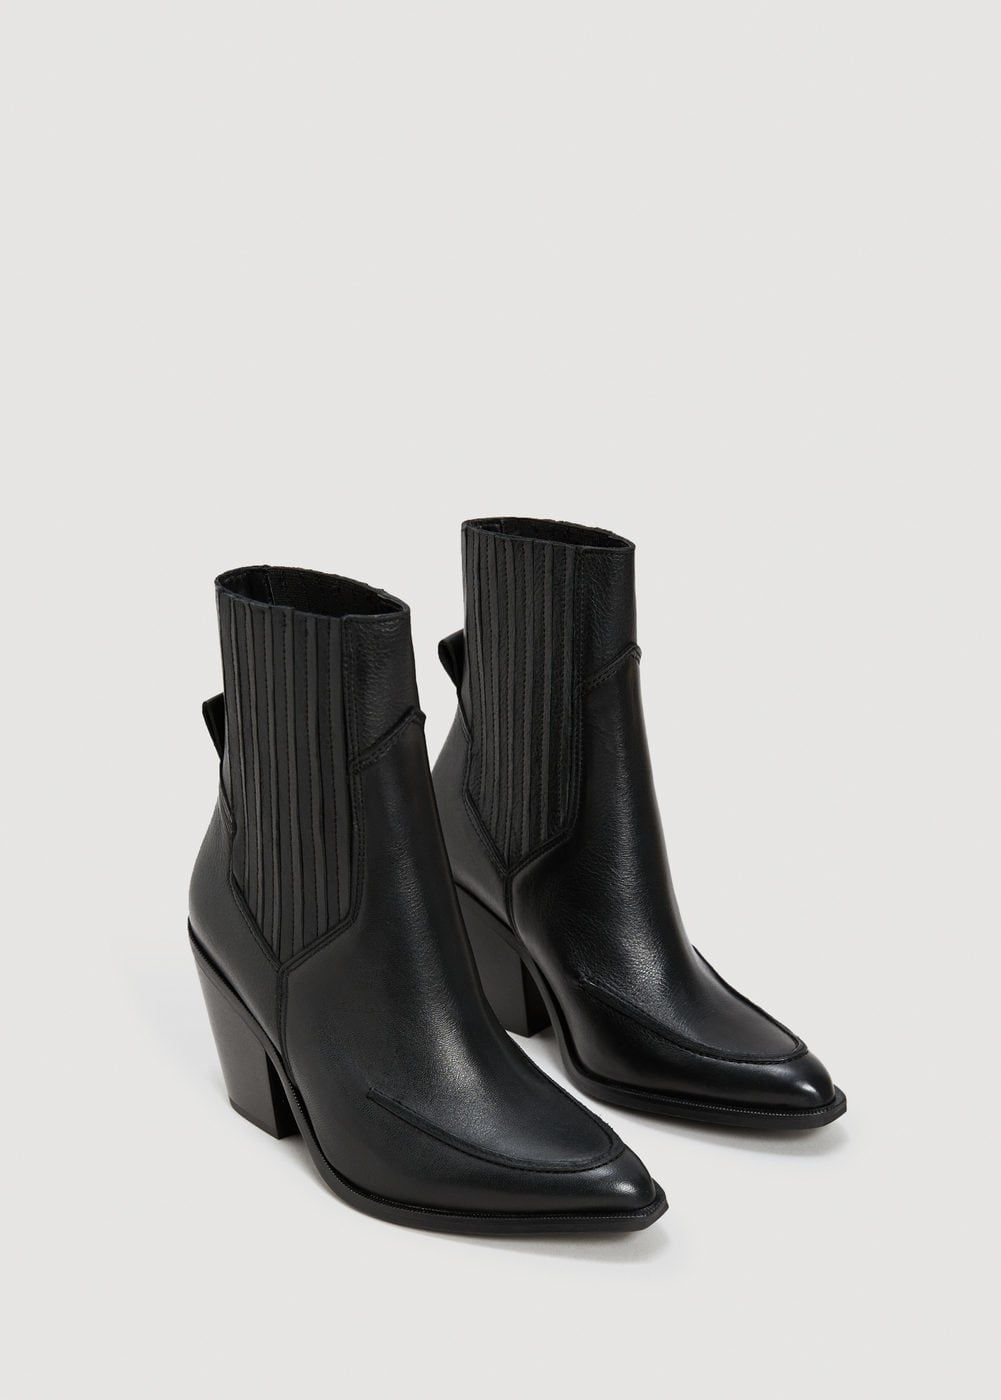 Bottines cuir cowboy - Femme   MANGO France   SHOES   Bottines en ... 59e9115670b